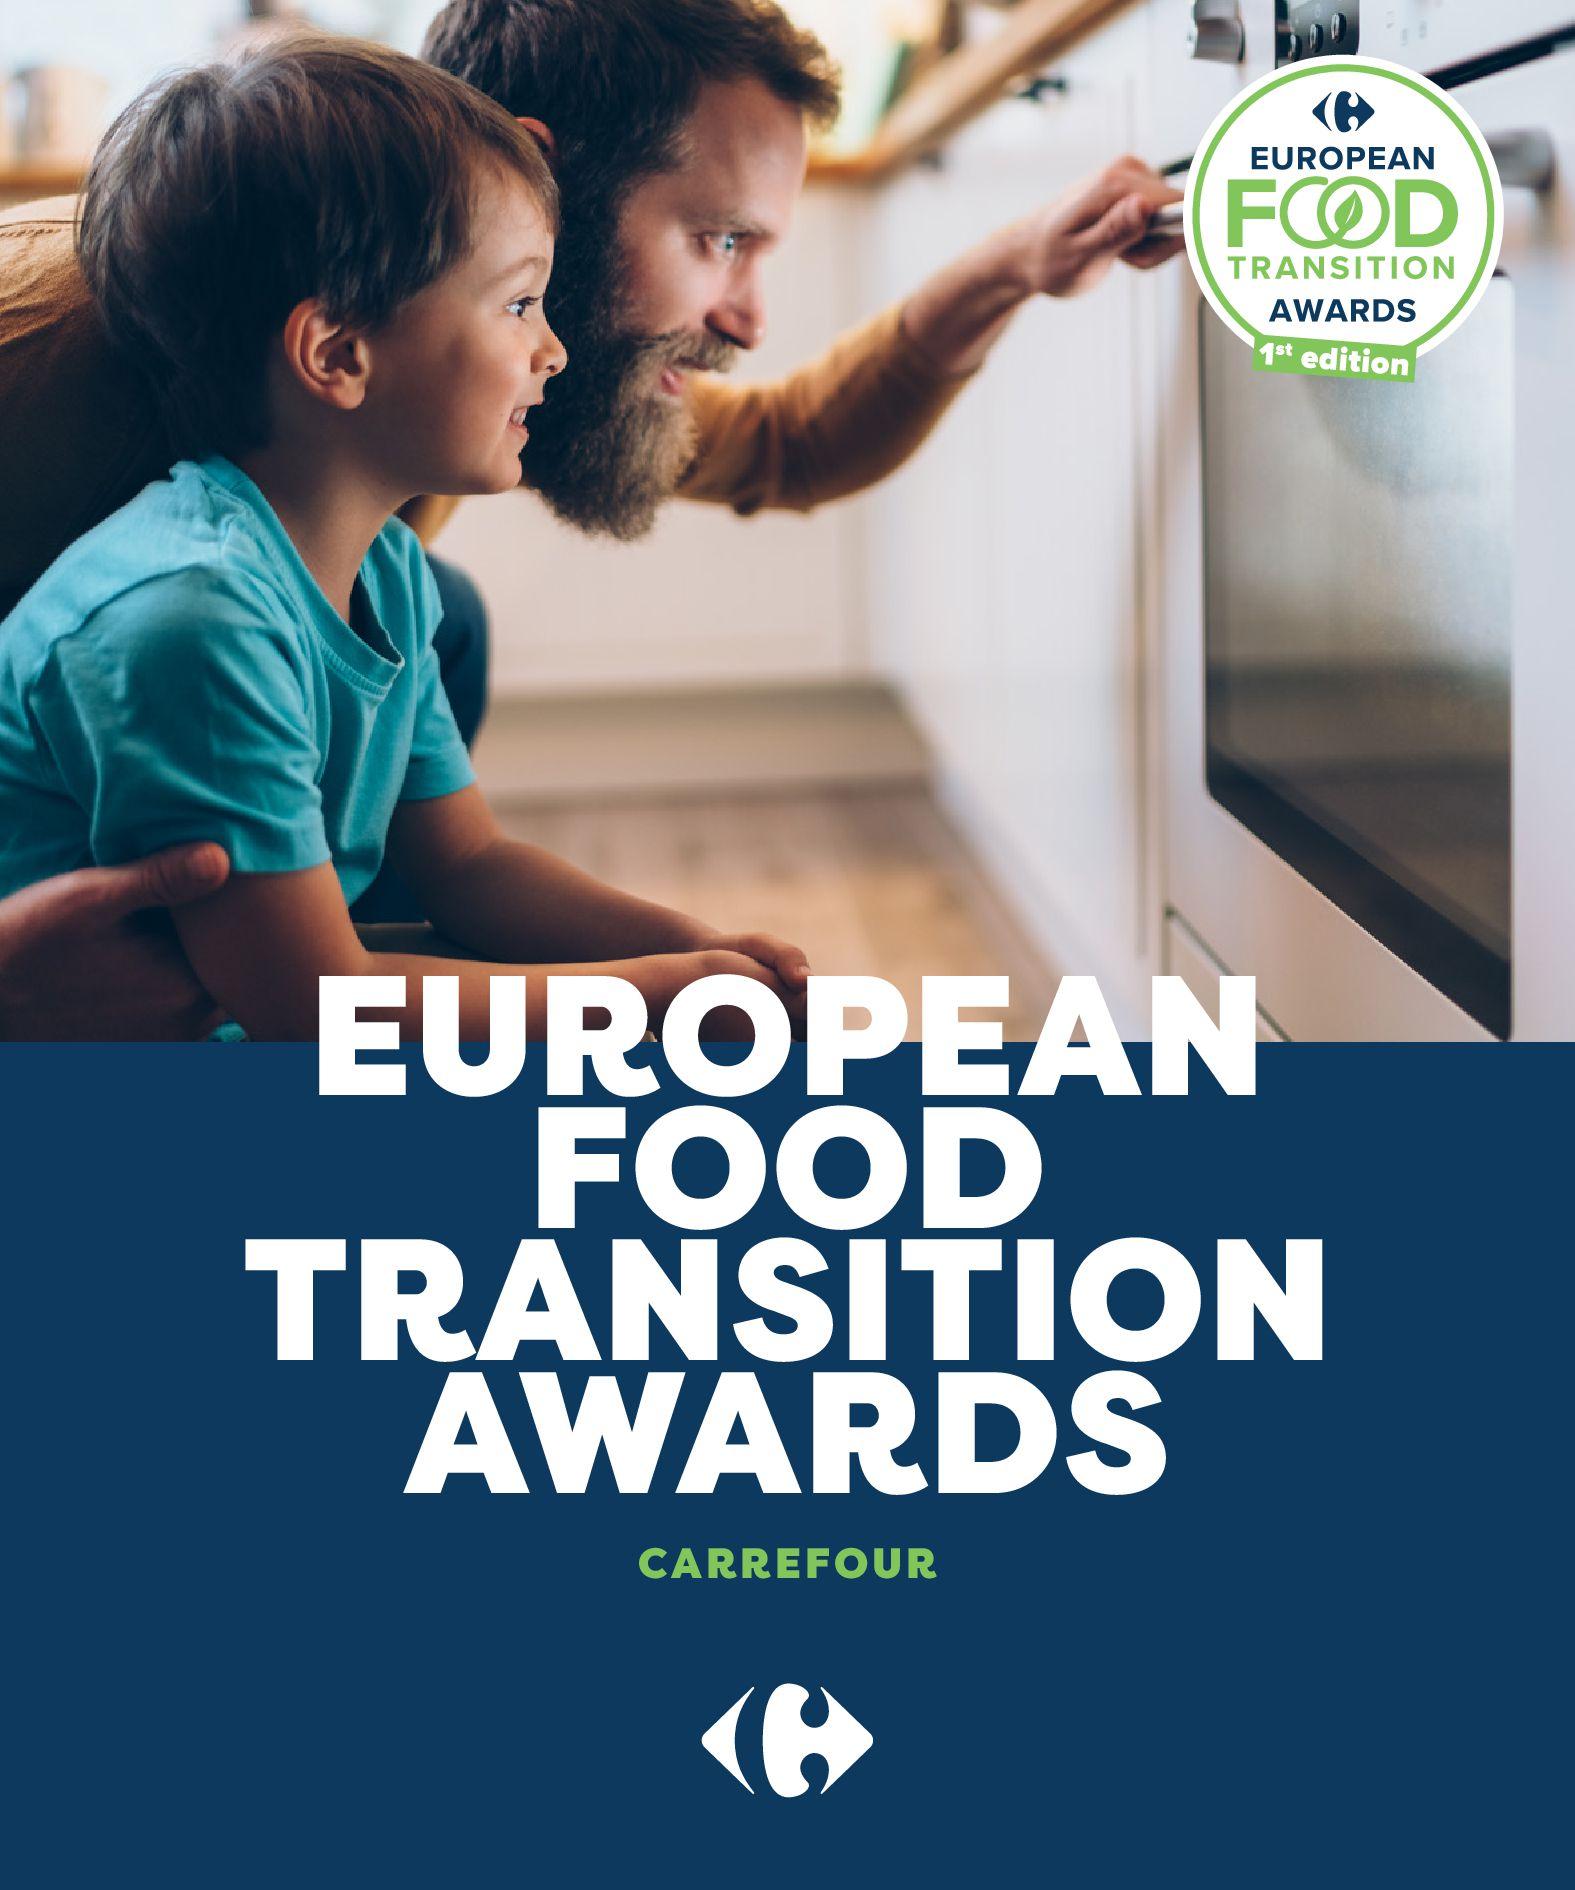 Carrefour:  Gazetka Carrefour - KONKURS  EUROPEAN  FOOD 15.10.2021